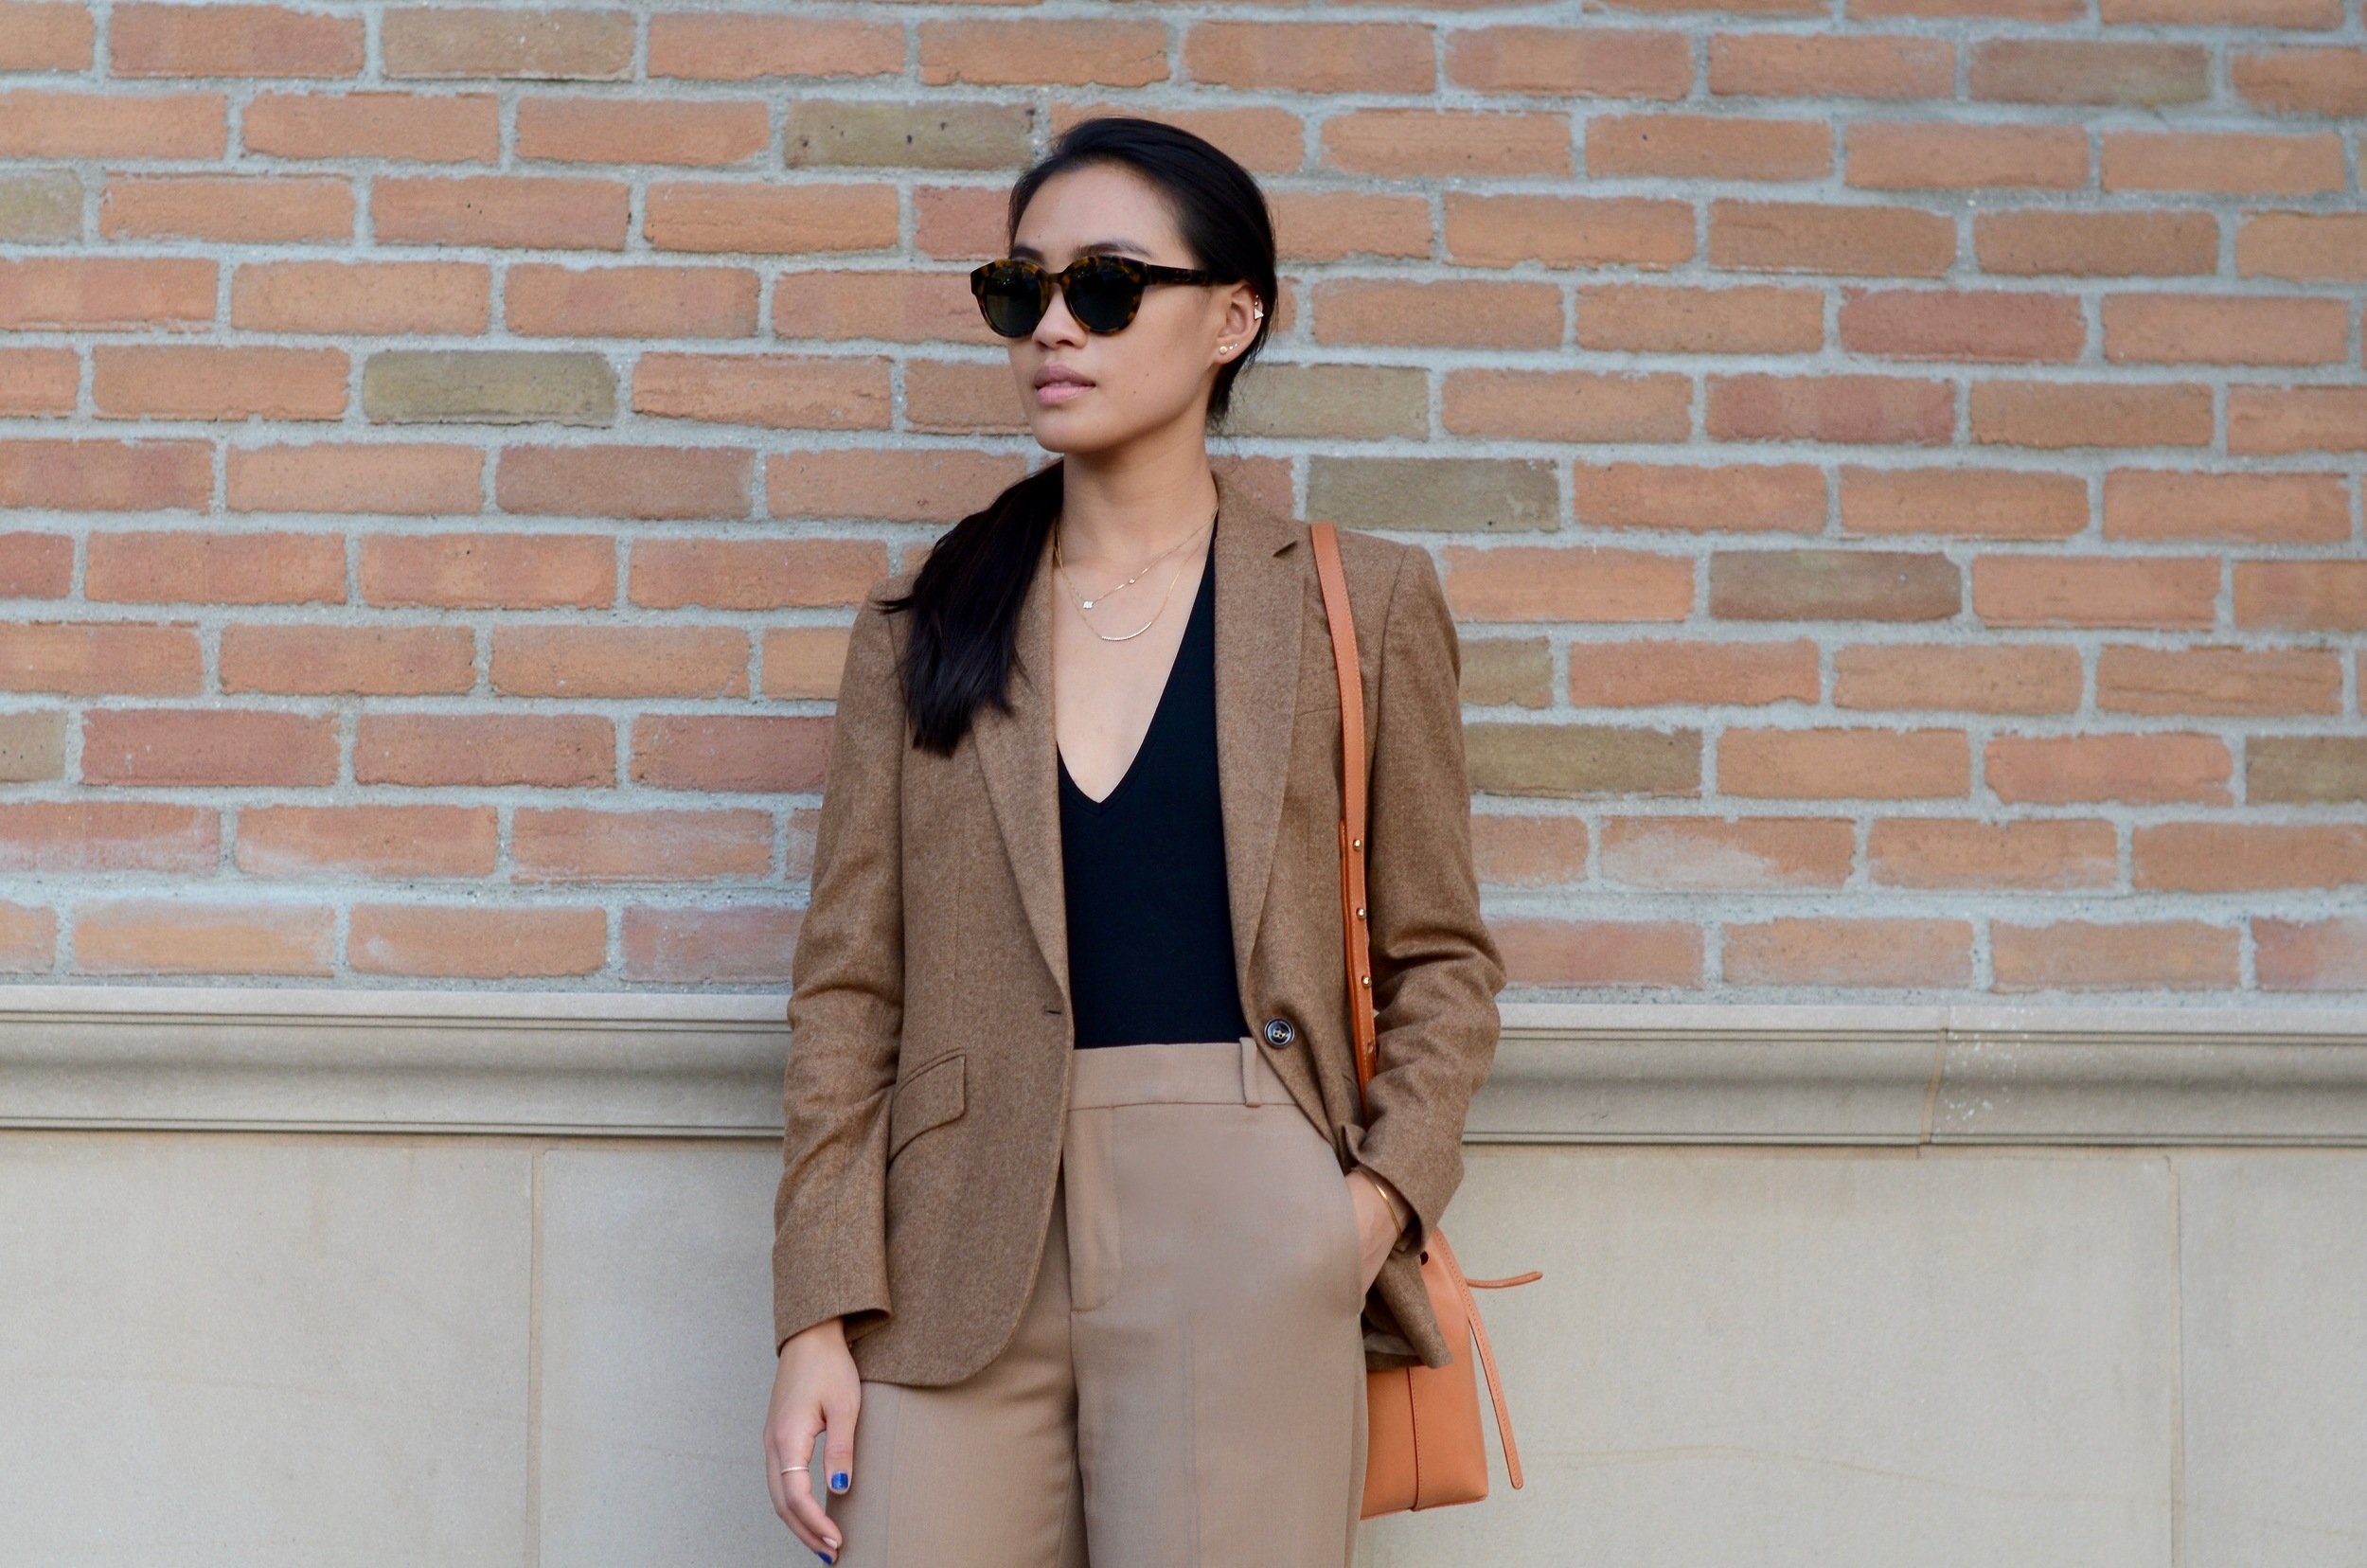 Just Goh With It-Outfit-shopstyle-dressforsuccess-zara-camel-wide-leg-pants-massimo-dutti-blazer-mansur-gavriel-mini-bucket-bag-7.jpg